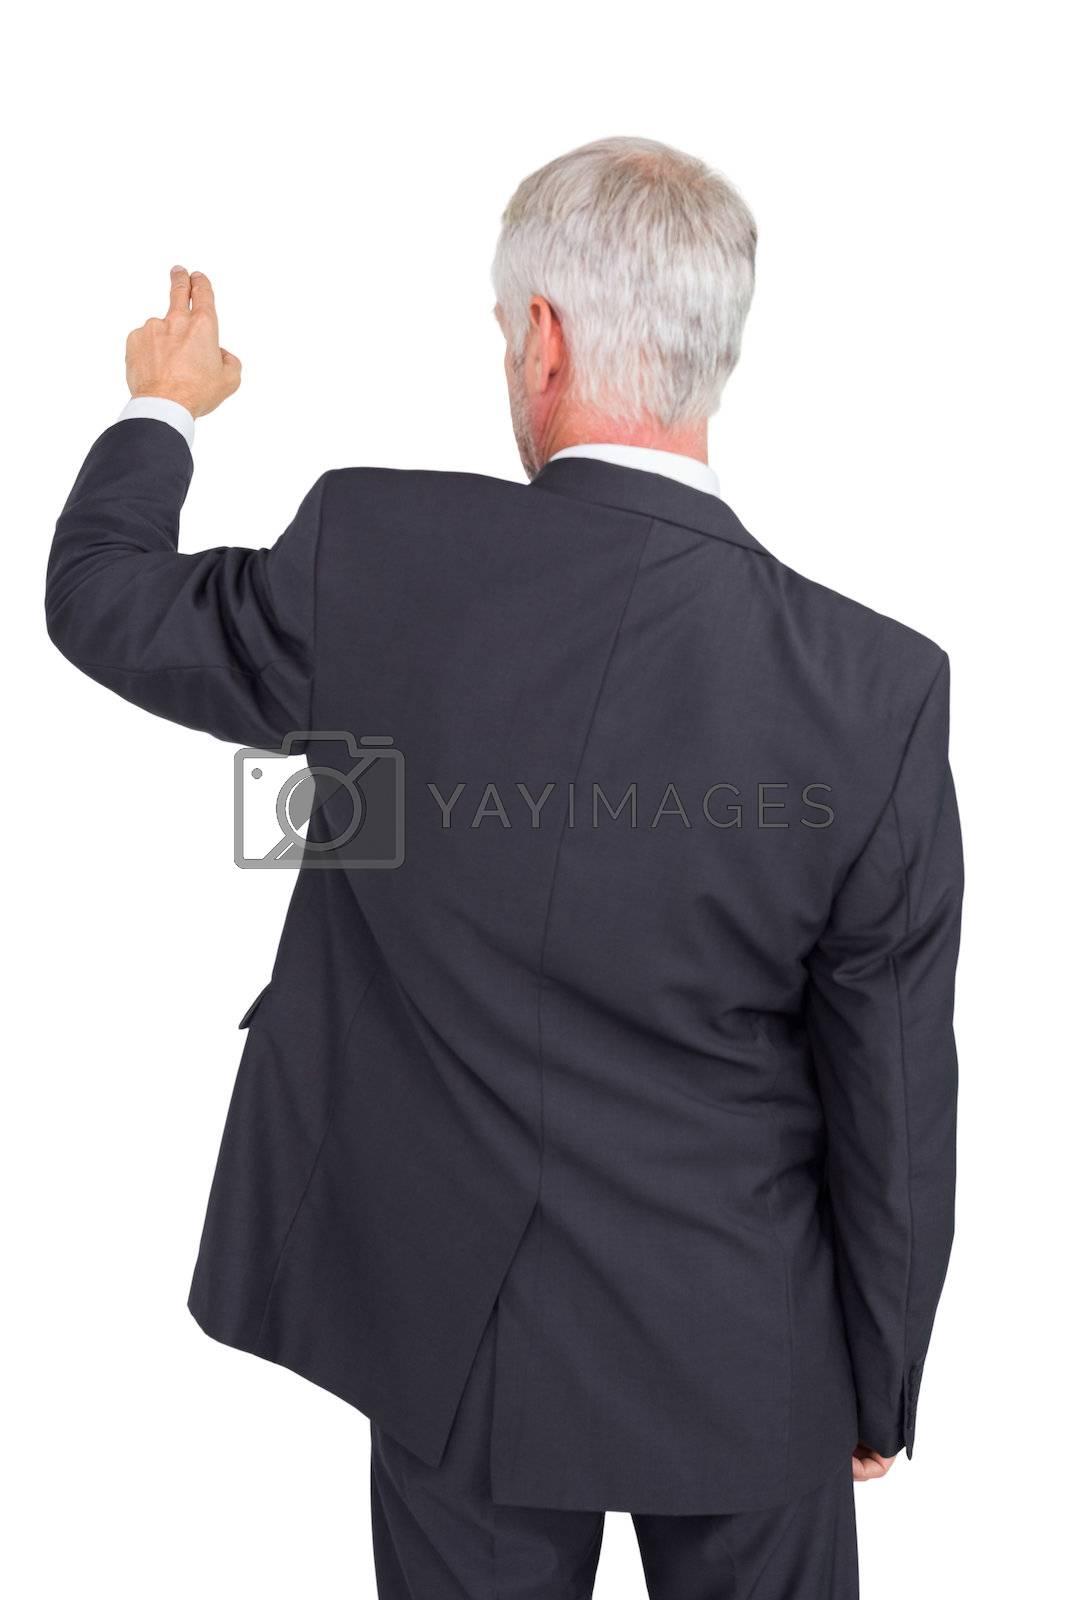 Businessman pointing at something by Wavebreakmedia